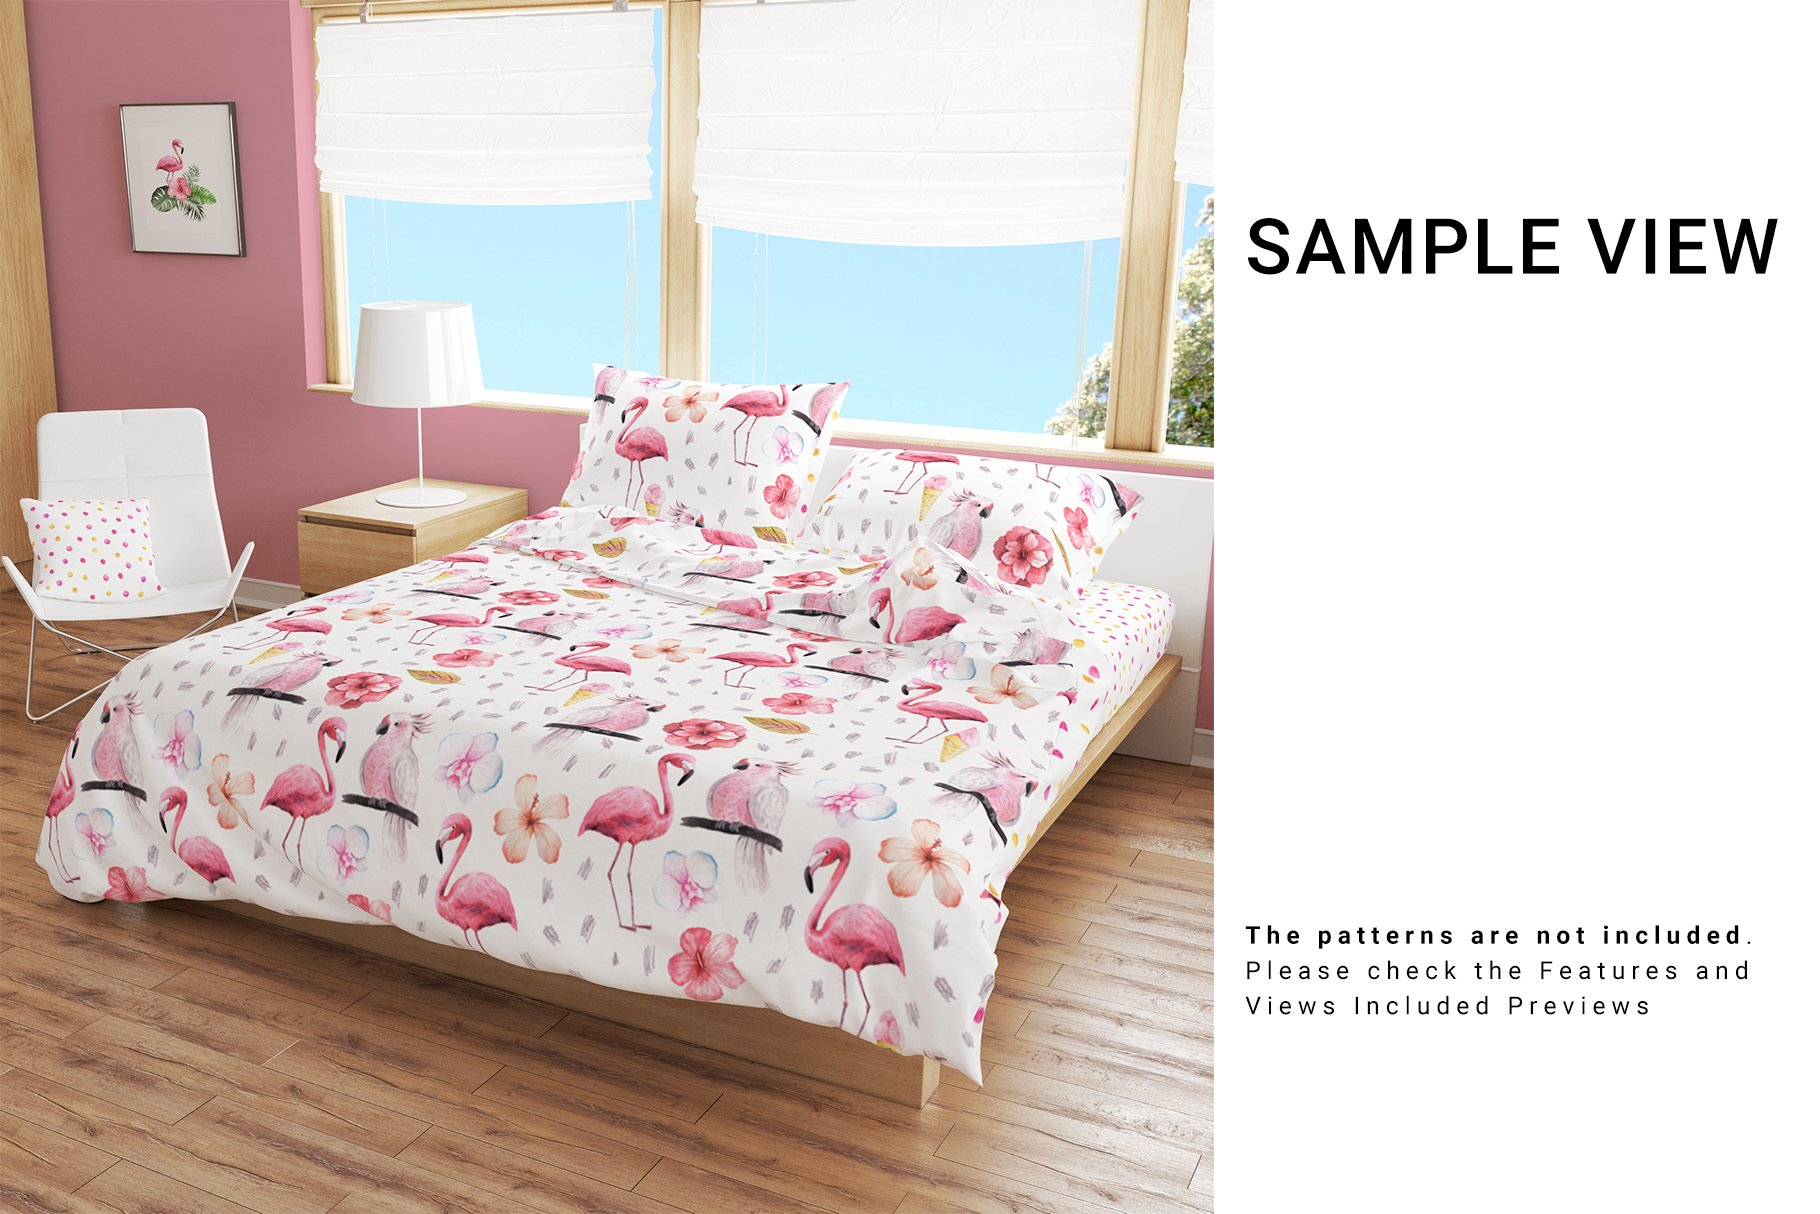 Bedroom Set - Bedding & Throw Pillow example image 4